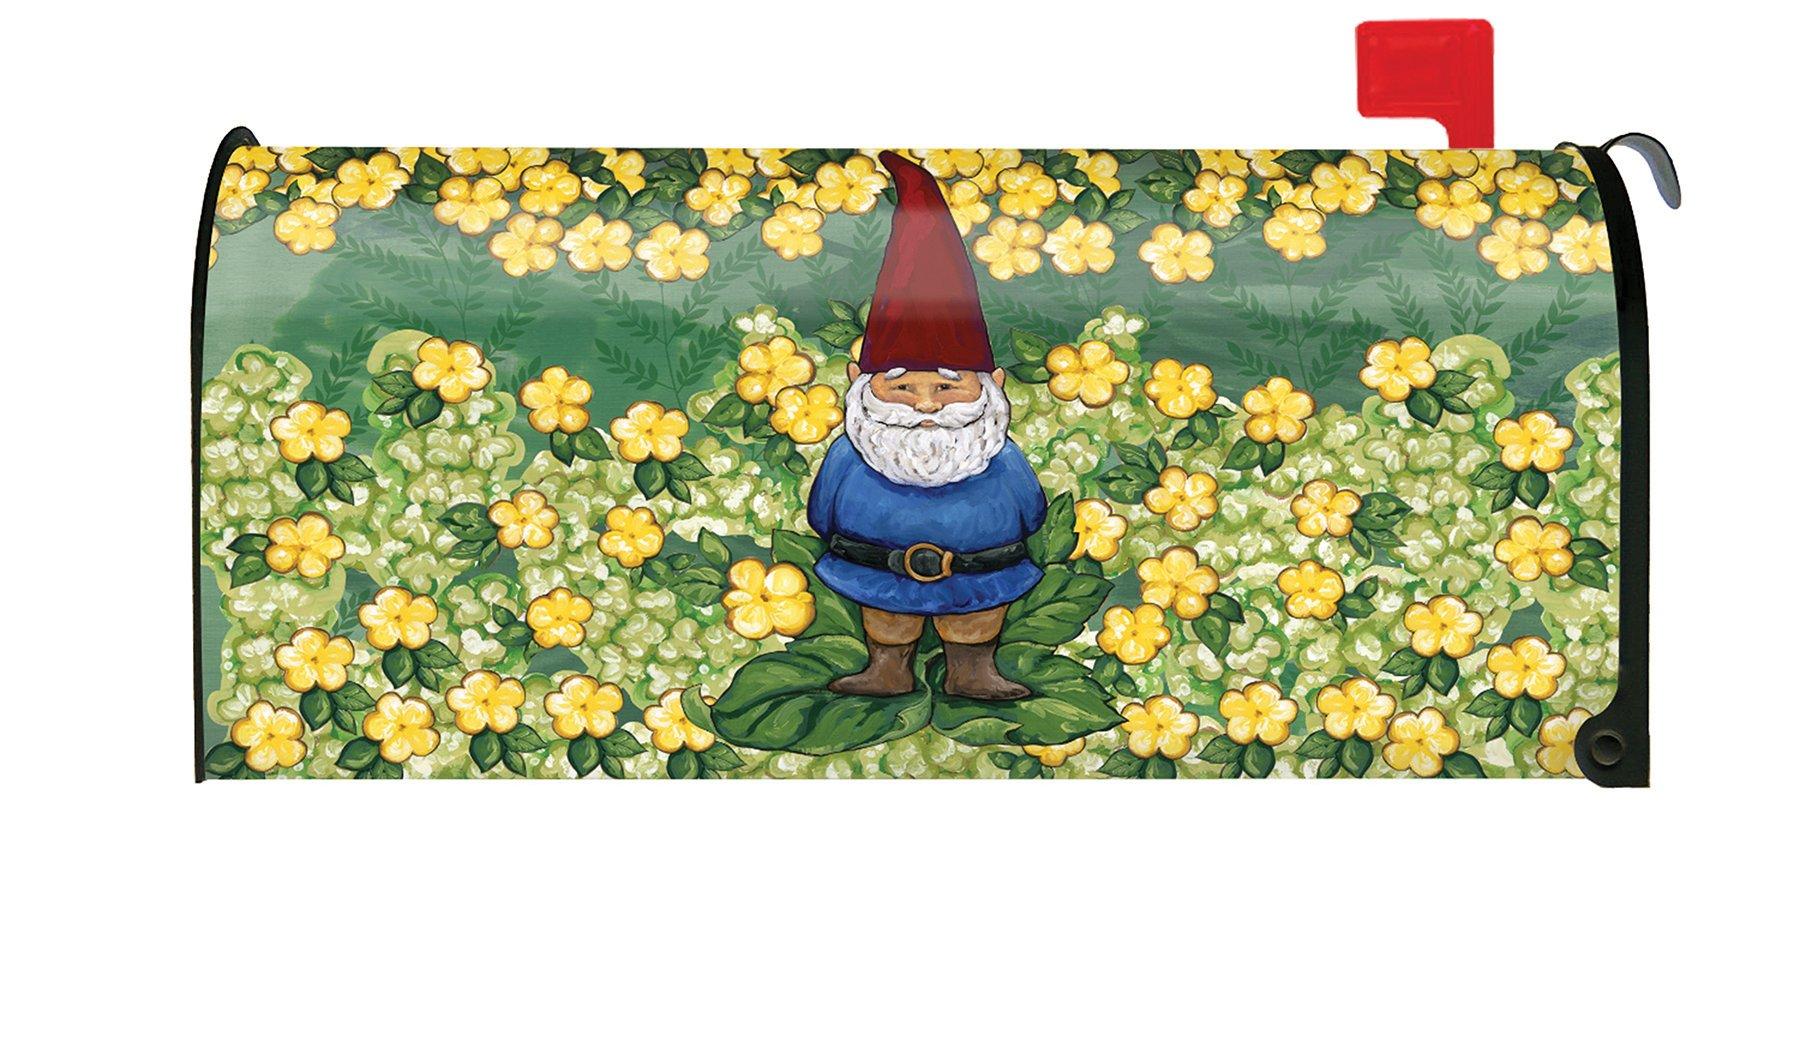 Toland Home Garden Garden Gnome Cute Spring Yellow Flower Magnetic Mailbox Cover